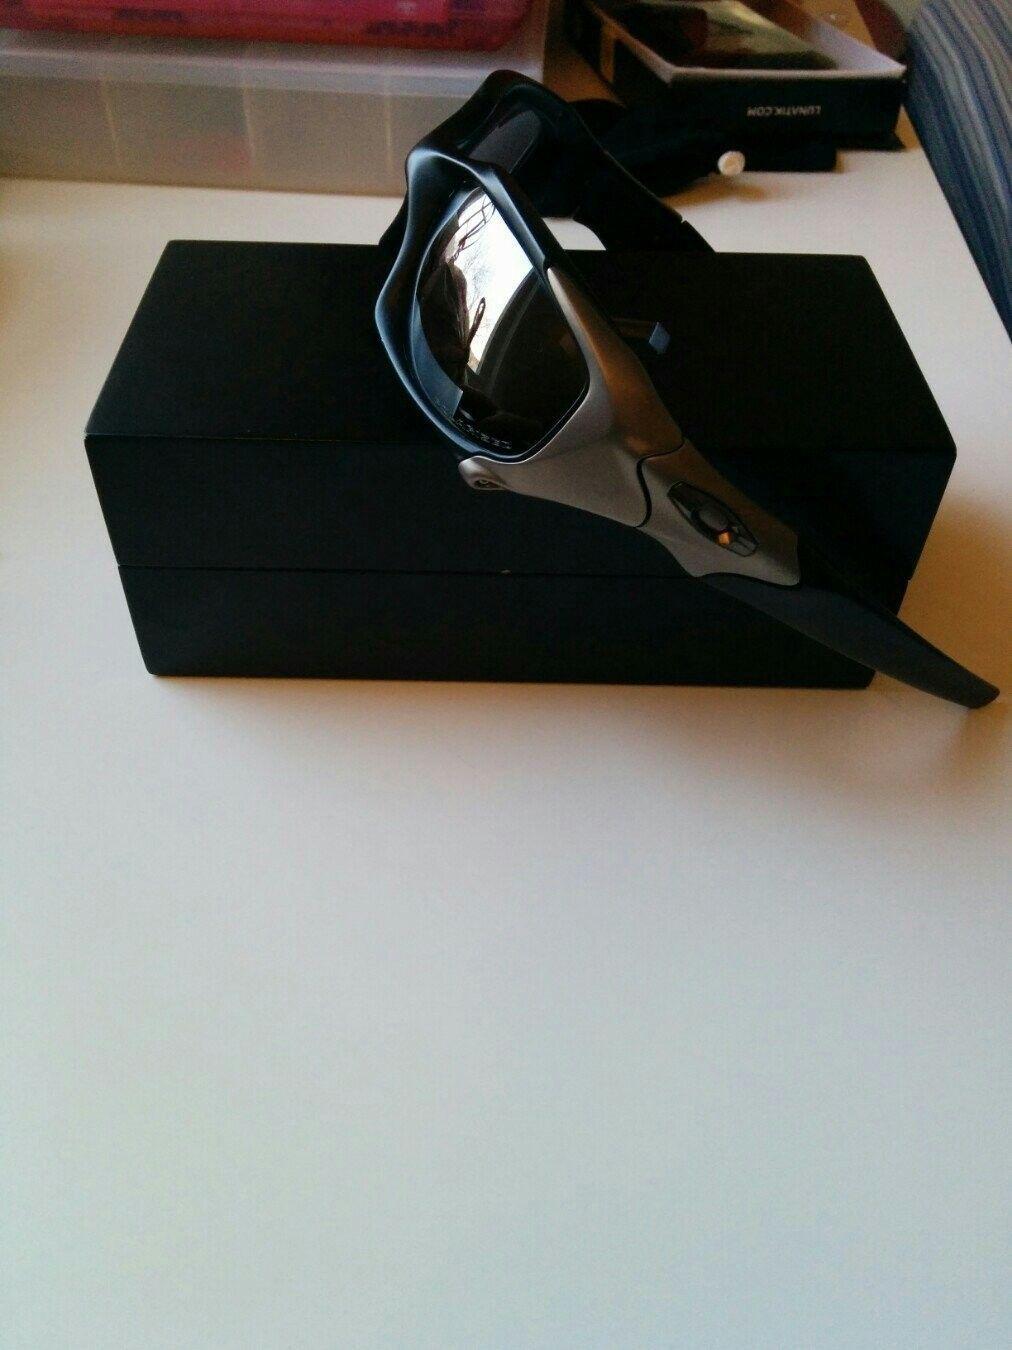 Matte Black PB1with Custom Cut 00 Bip Lenses - u4y8unyb.jpg